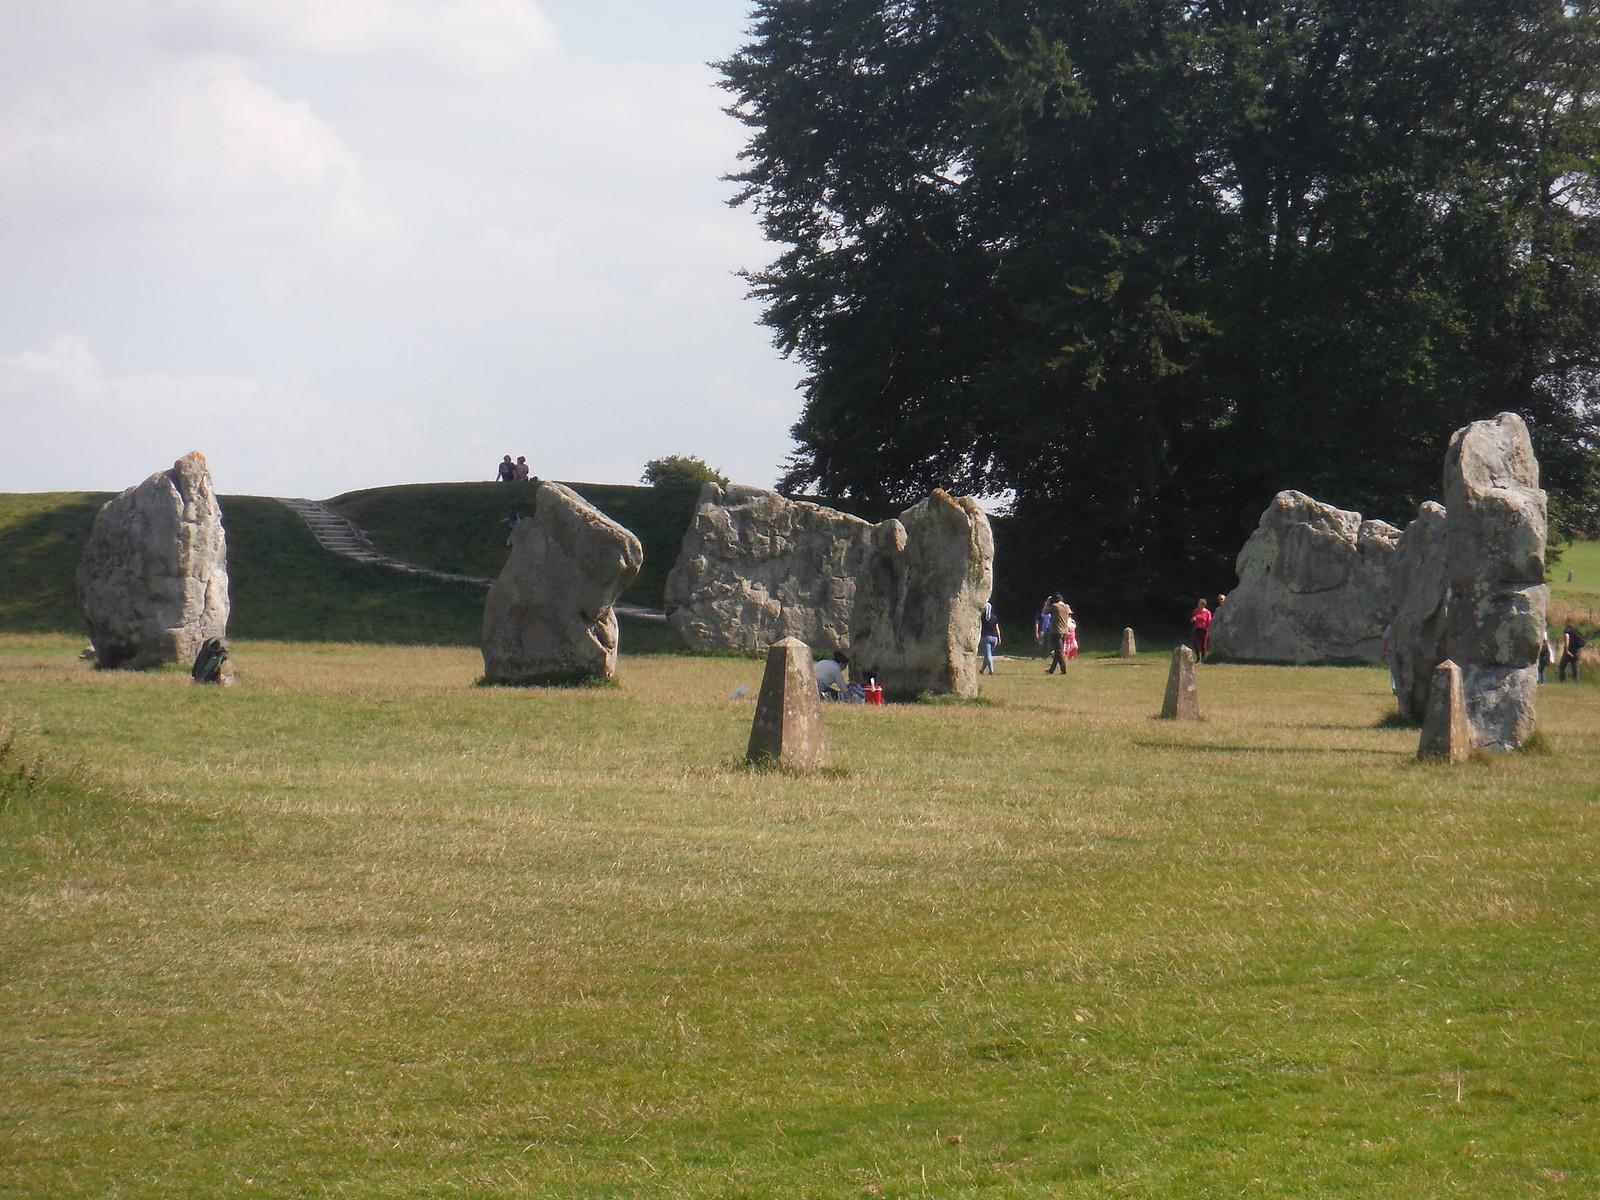 Avebury Standing Stones, SE quartile SWC Walk 255 Pewsey or Marlborough Circular via Avebury